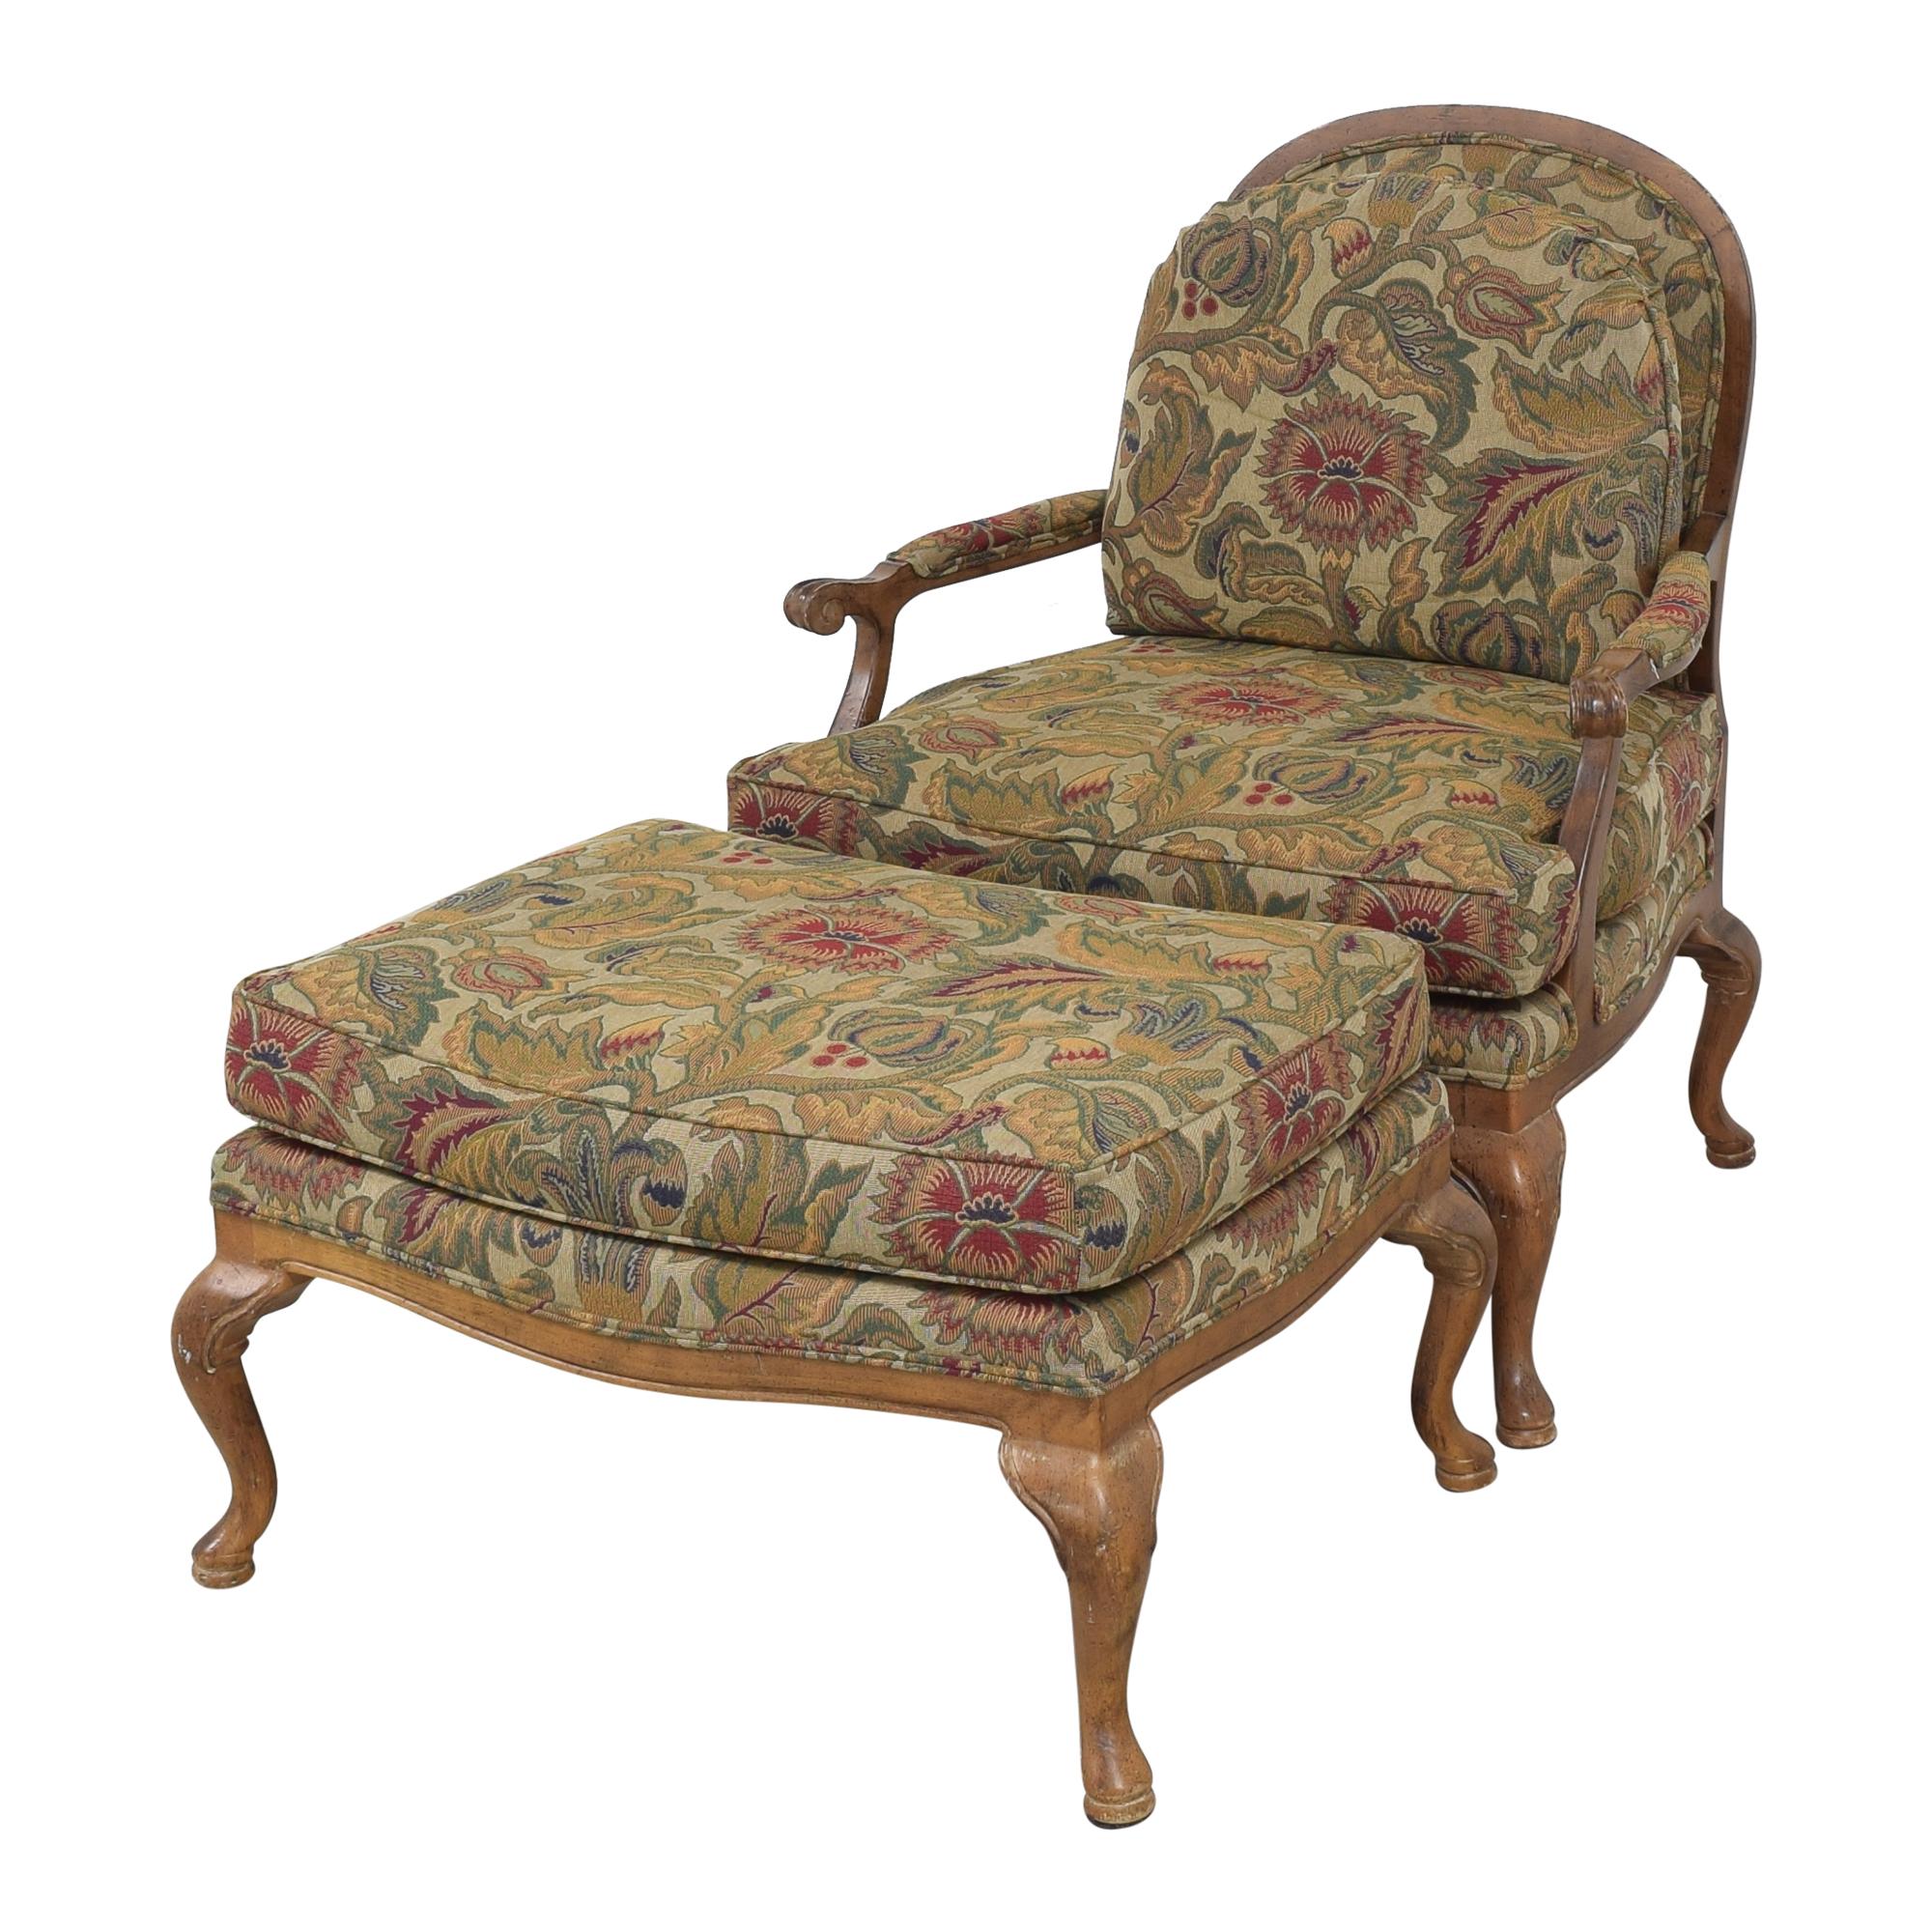 Thomasville Thomasville Bergere Chair and Ottoman pa